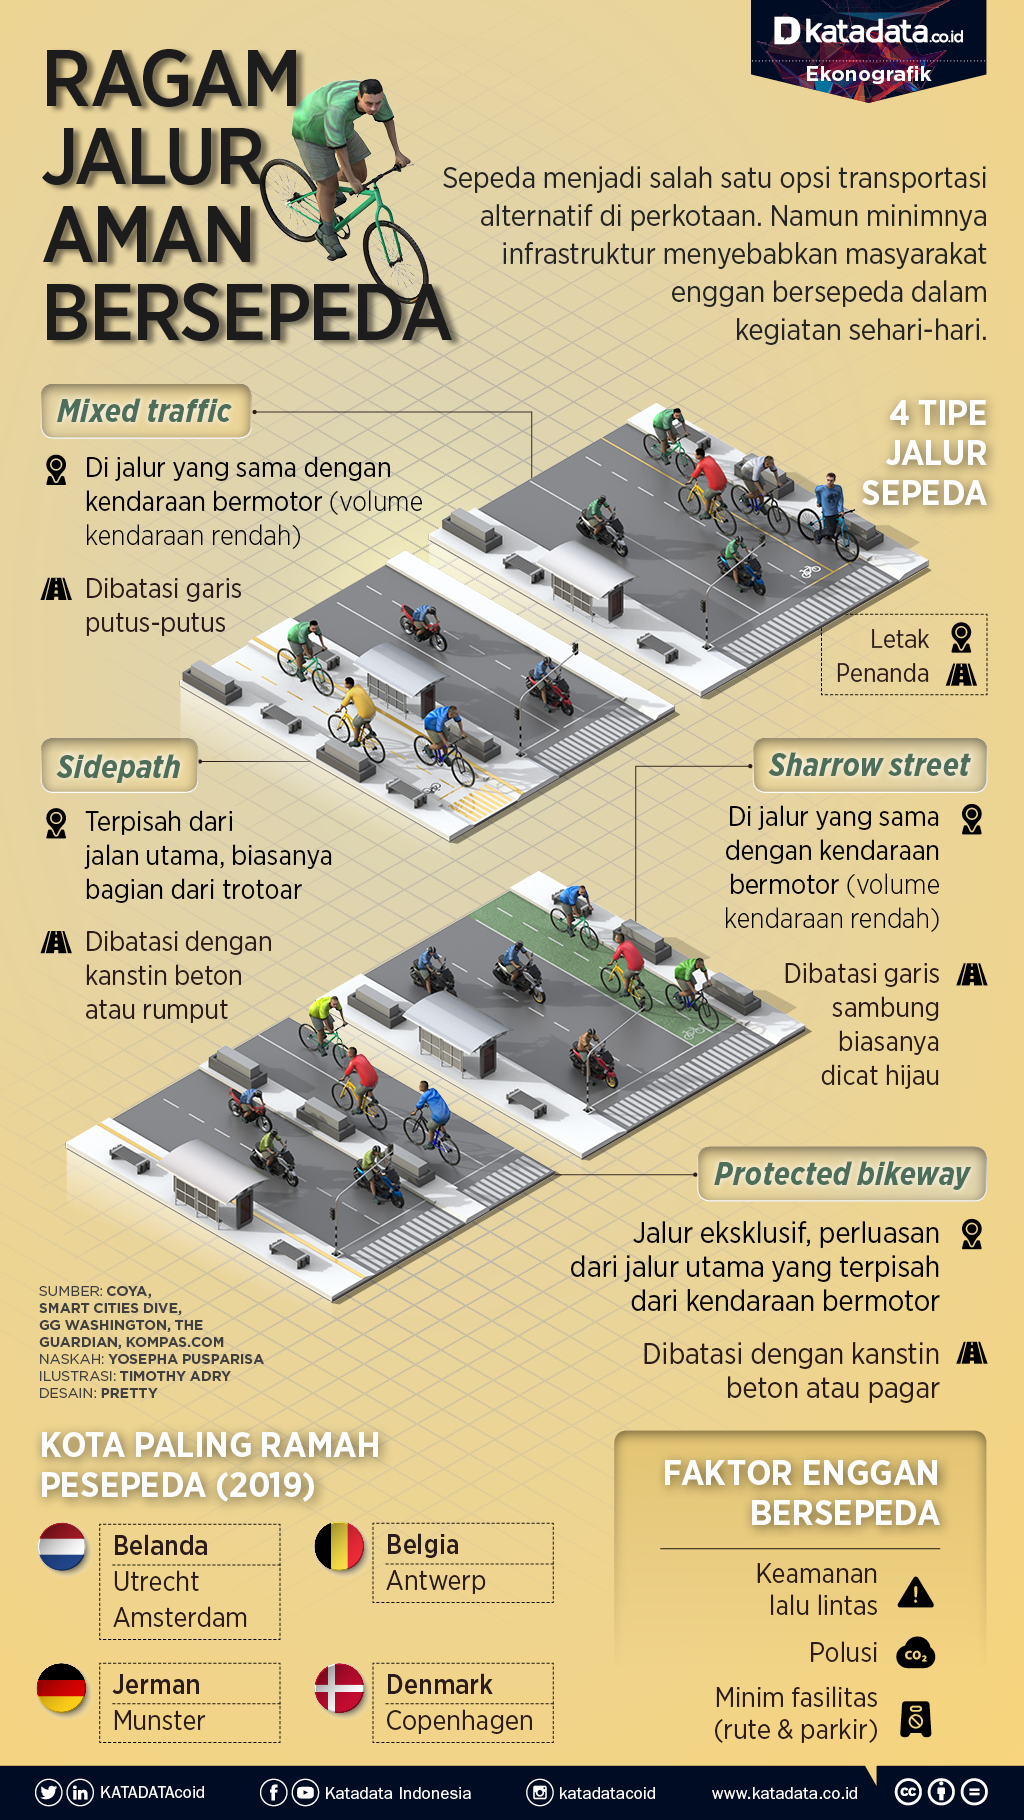 Jalur sepeda